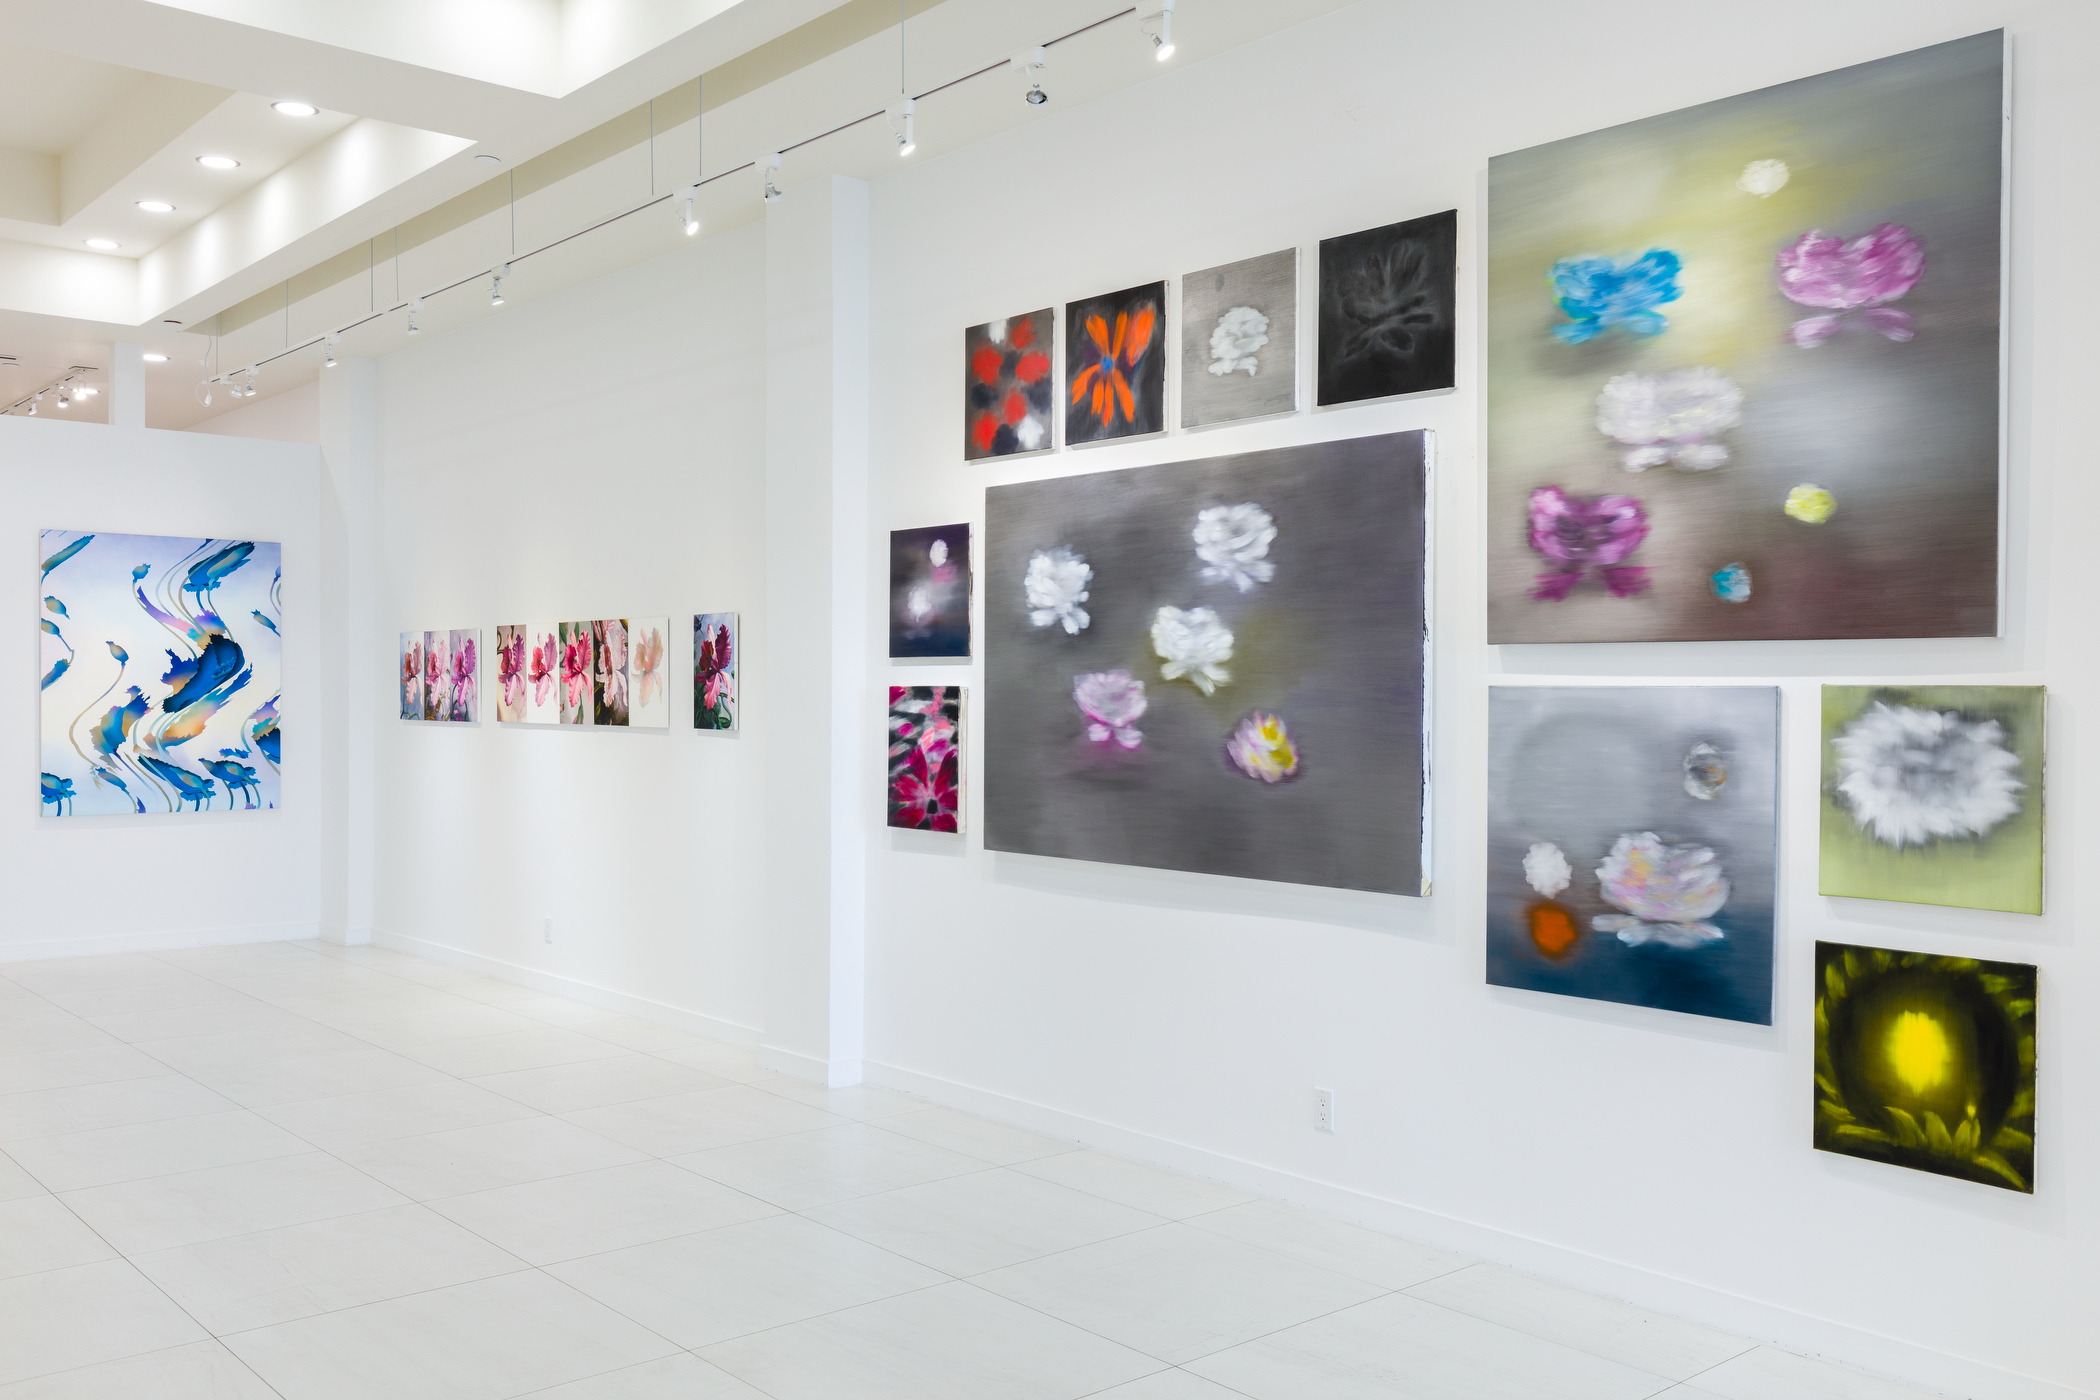 003 Brintz Gallery.JPG